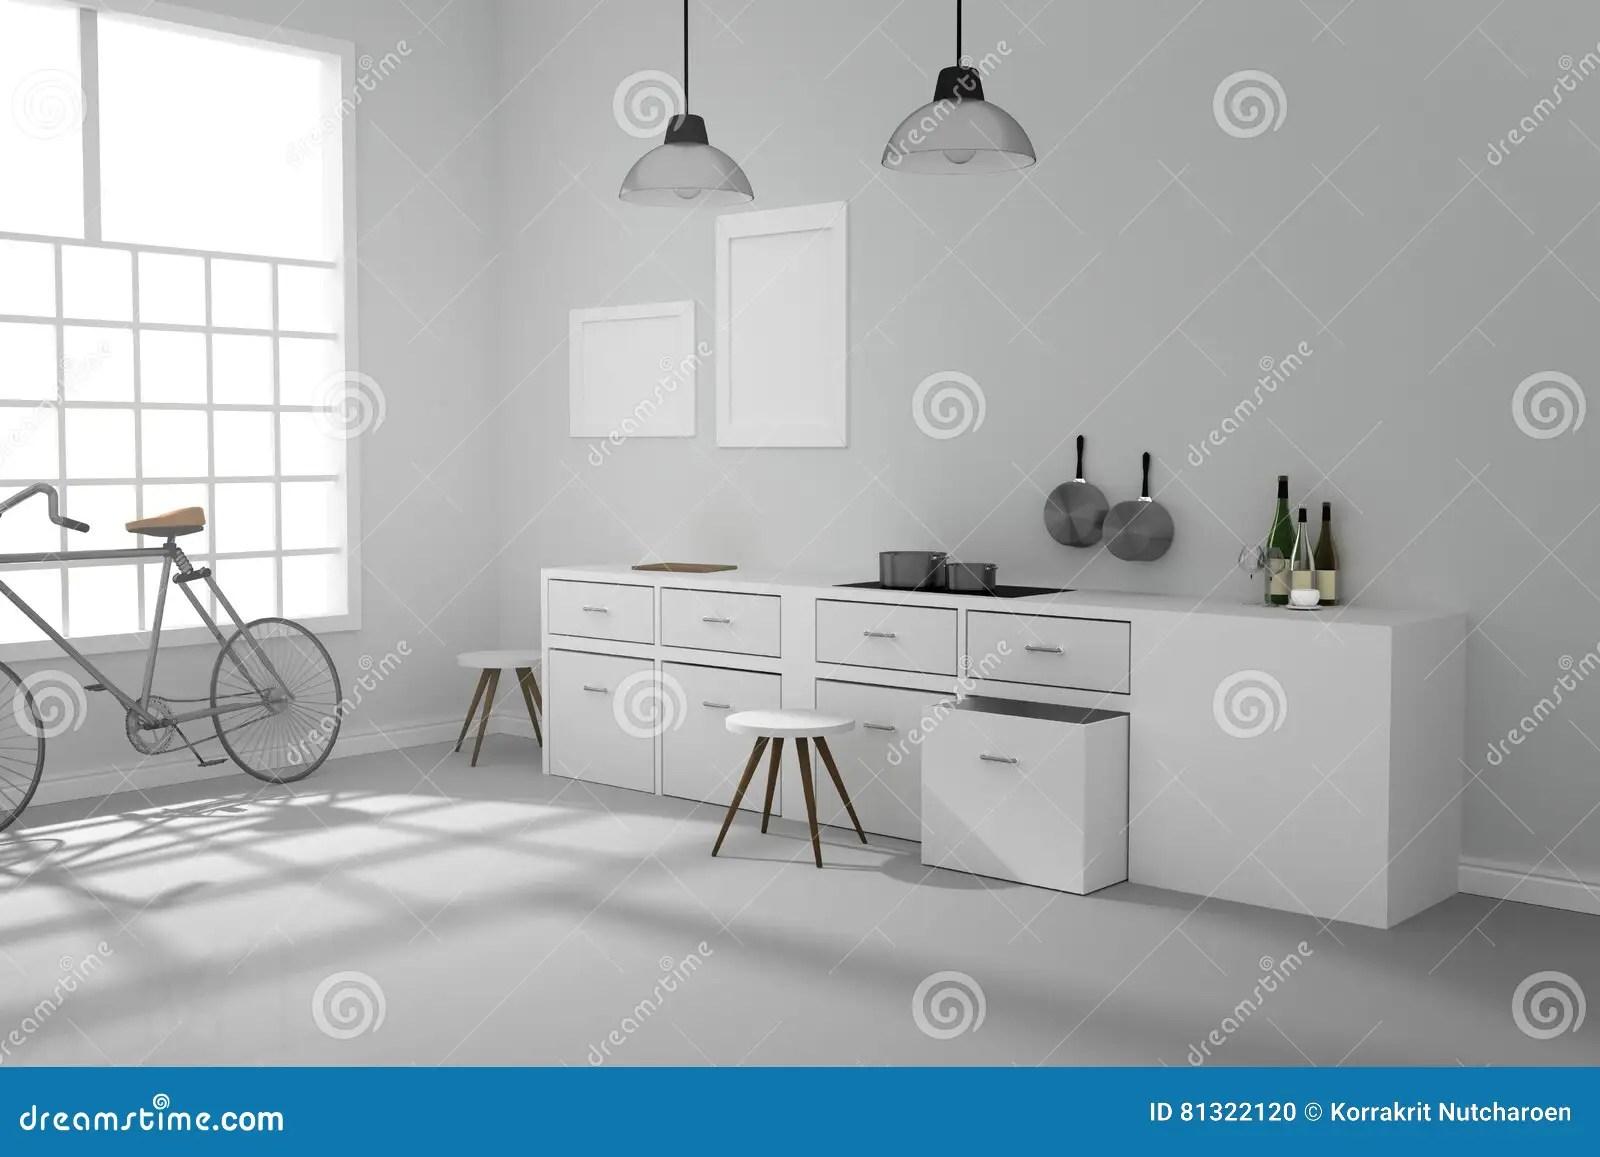 modern kitchen lights dornbracht faucet 3d翻译 白色内部现代厨房室设计的例证与两葡萄酒灯垂悬的发光的灰色地板 白色内部现代厨房室设计的例证与两葡萄酒灯垂